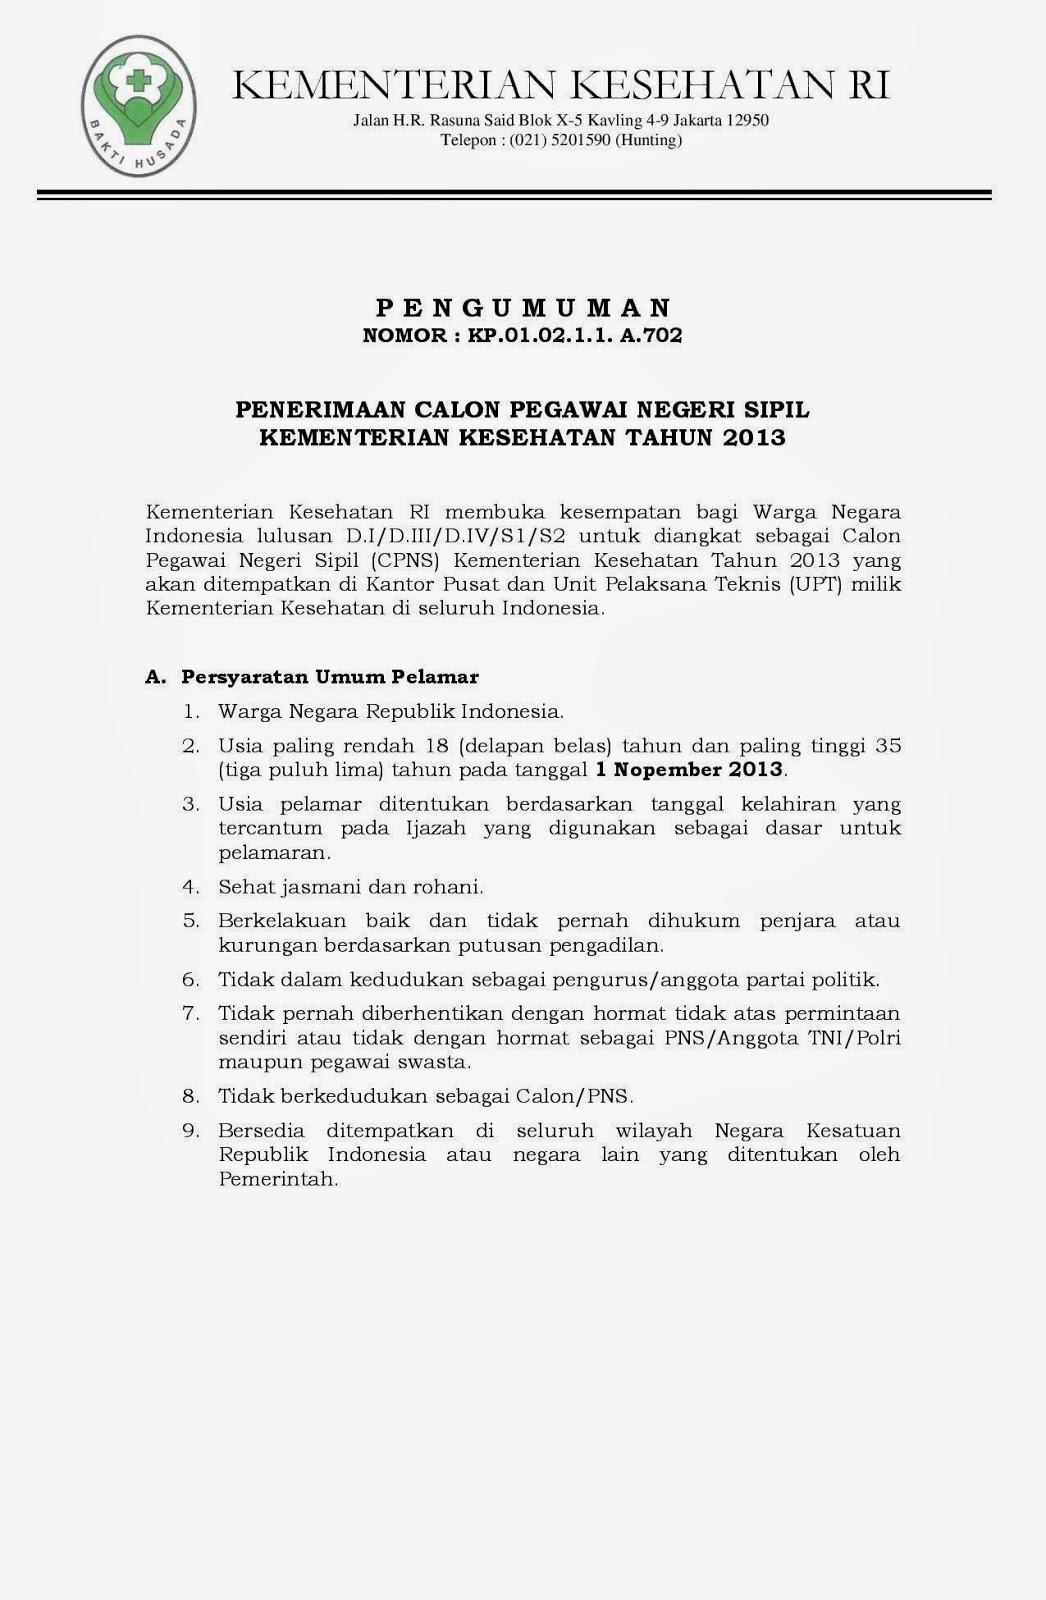 Penerimaan Cpns Depkes 2013 Cpns 2016 Cpnsindonesiacom Penerimaan Cpns Kementrian Kesehatan Tahun 2013 Lowongan Kompas